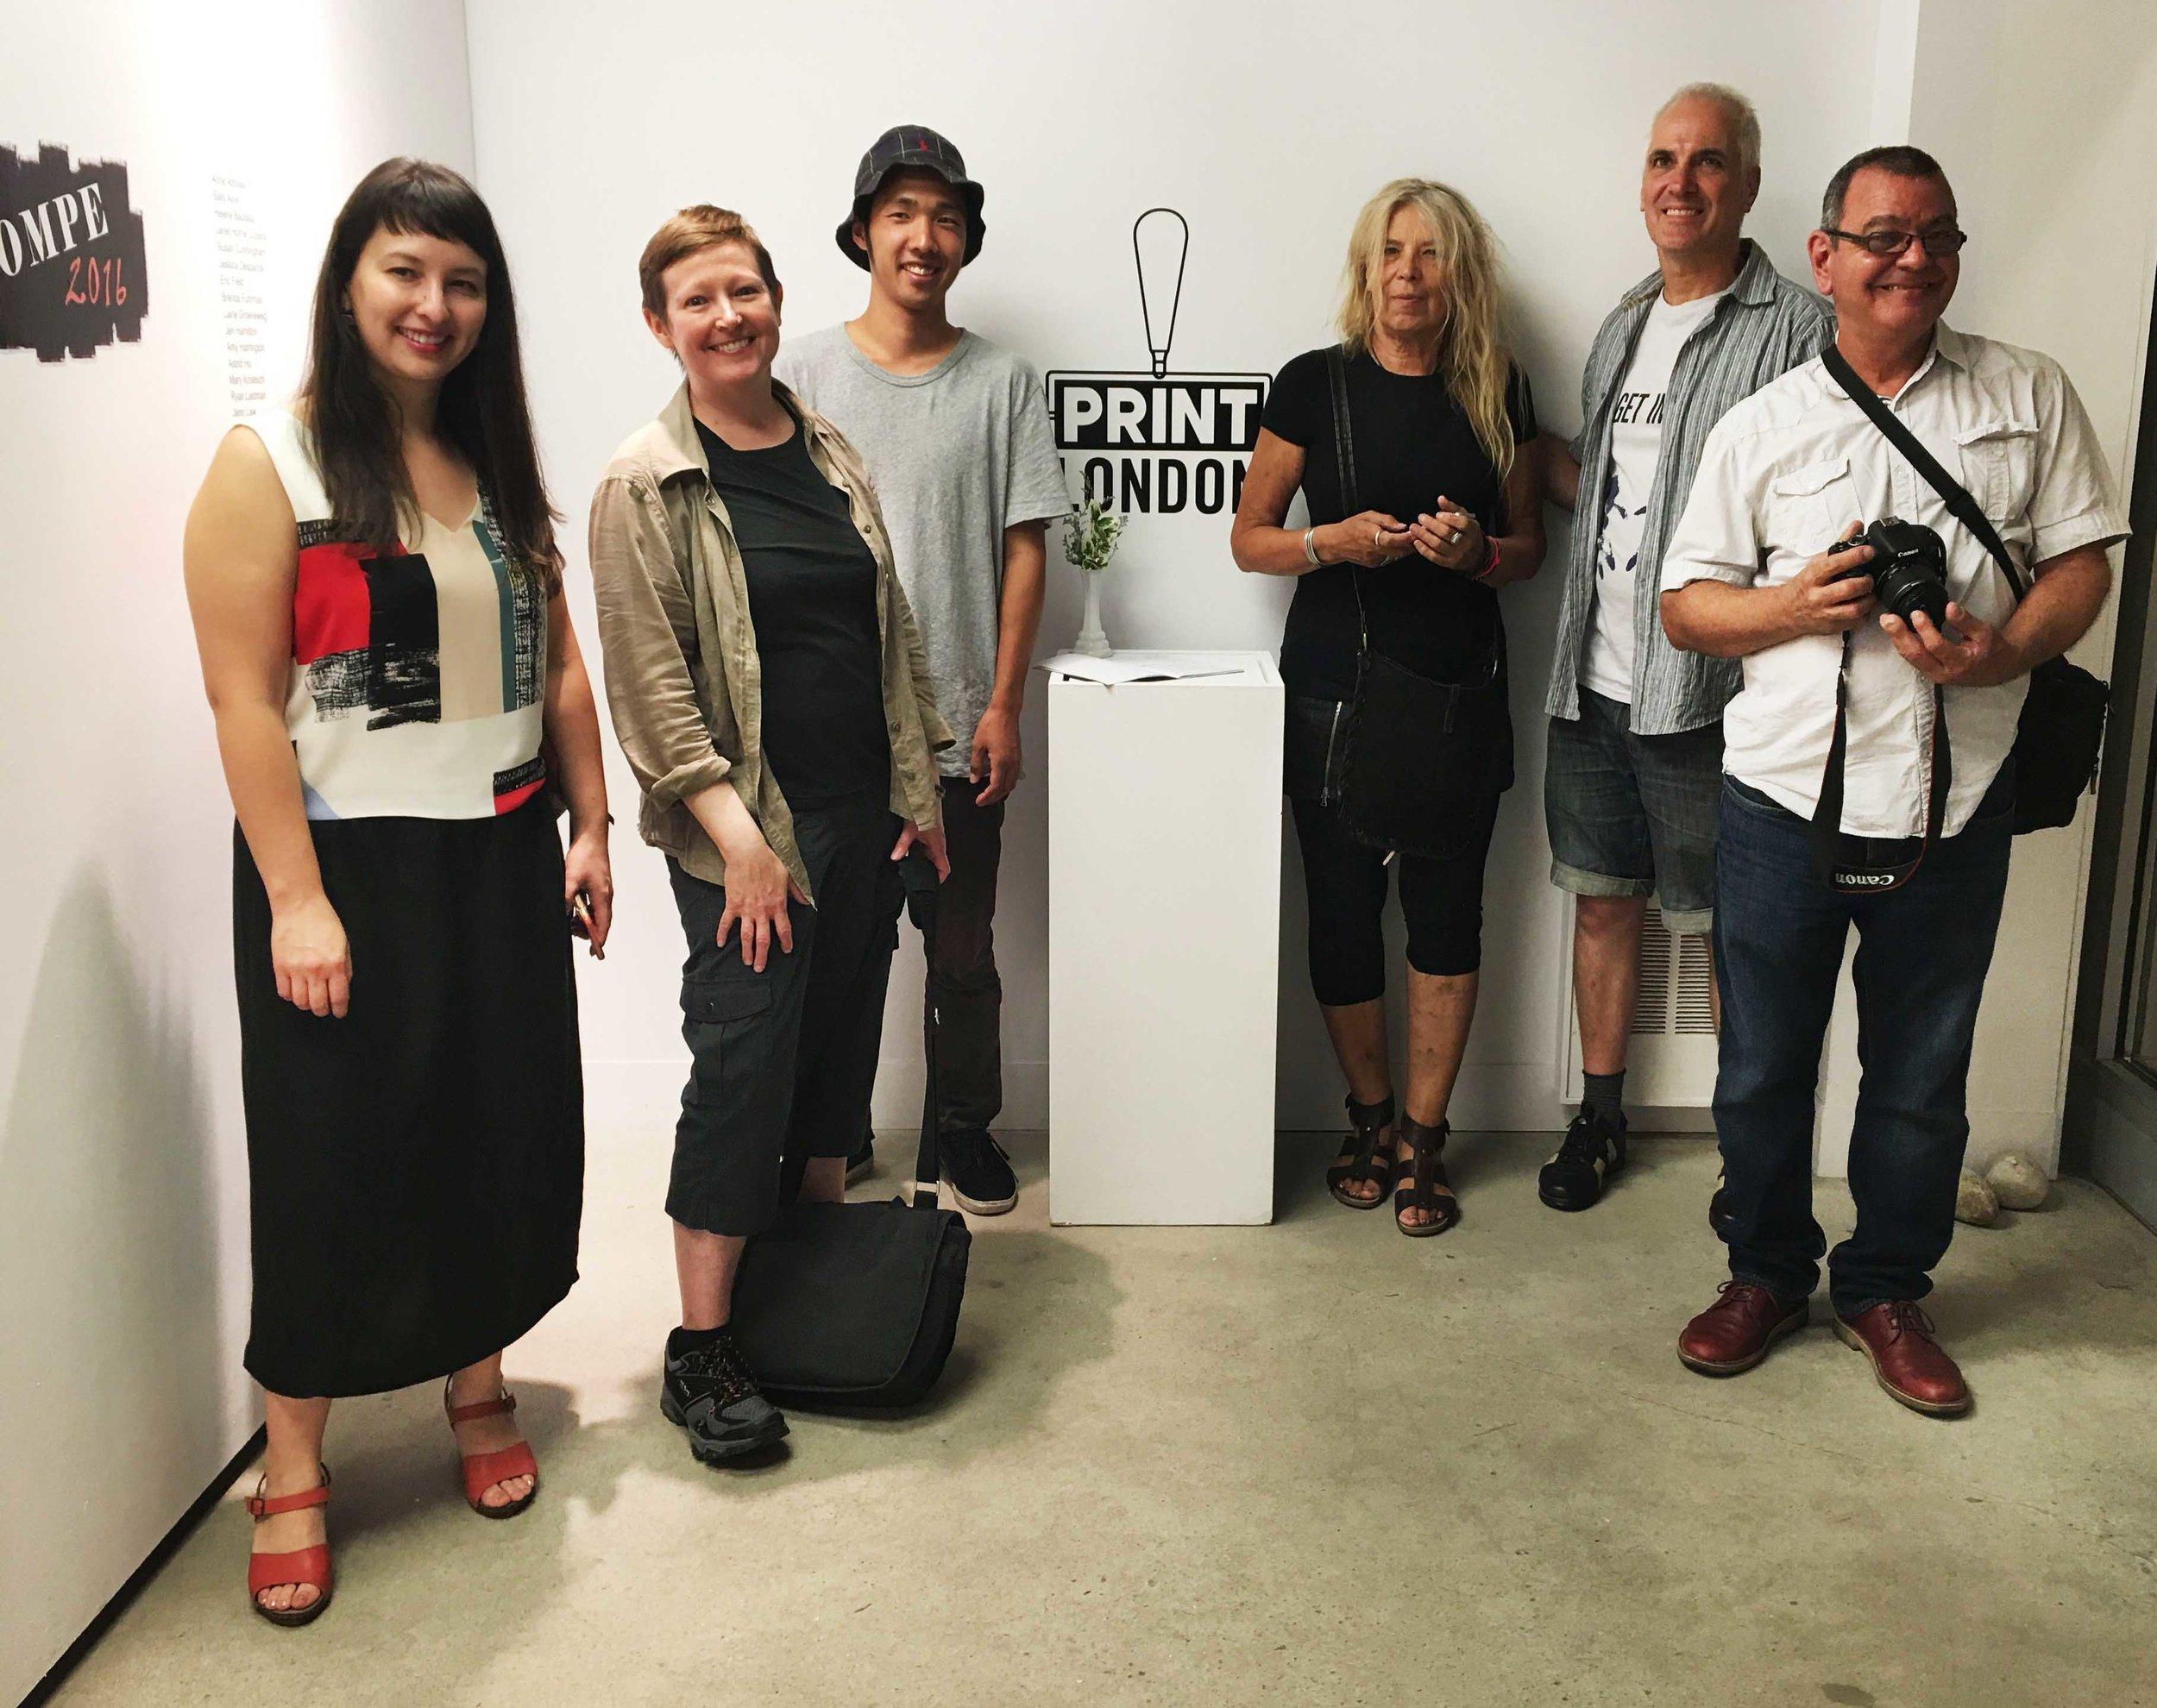 Friends from Open Studio in Toronto (Left to Right): Amy Uyeda,Loree Ovens,Shogo Okada,Irina Schestakowich,  Kurt Pammer,  Agustin Rolando Rojas